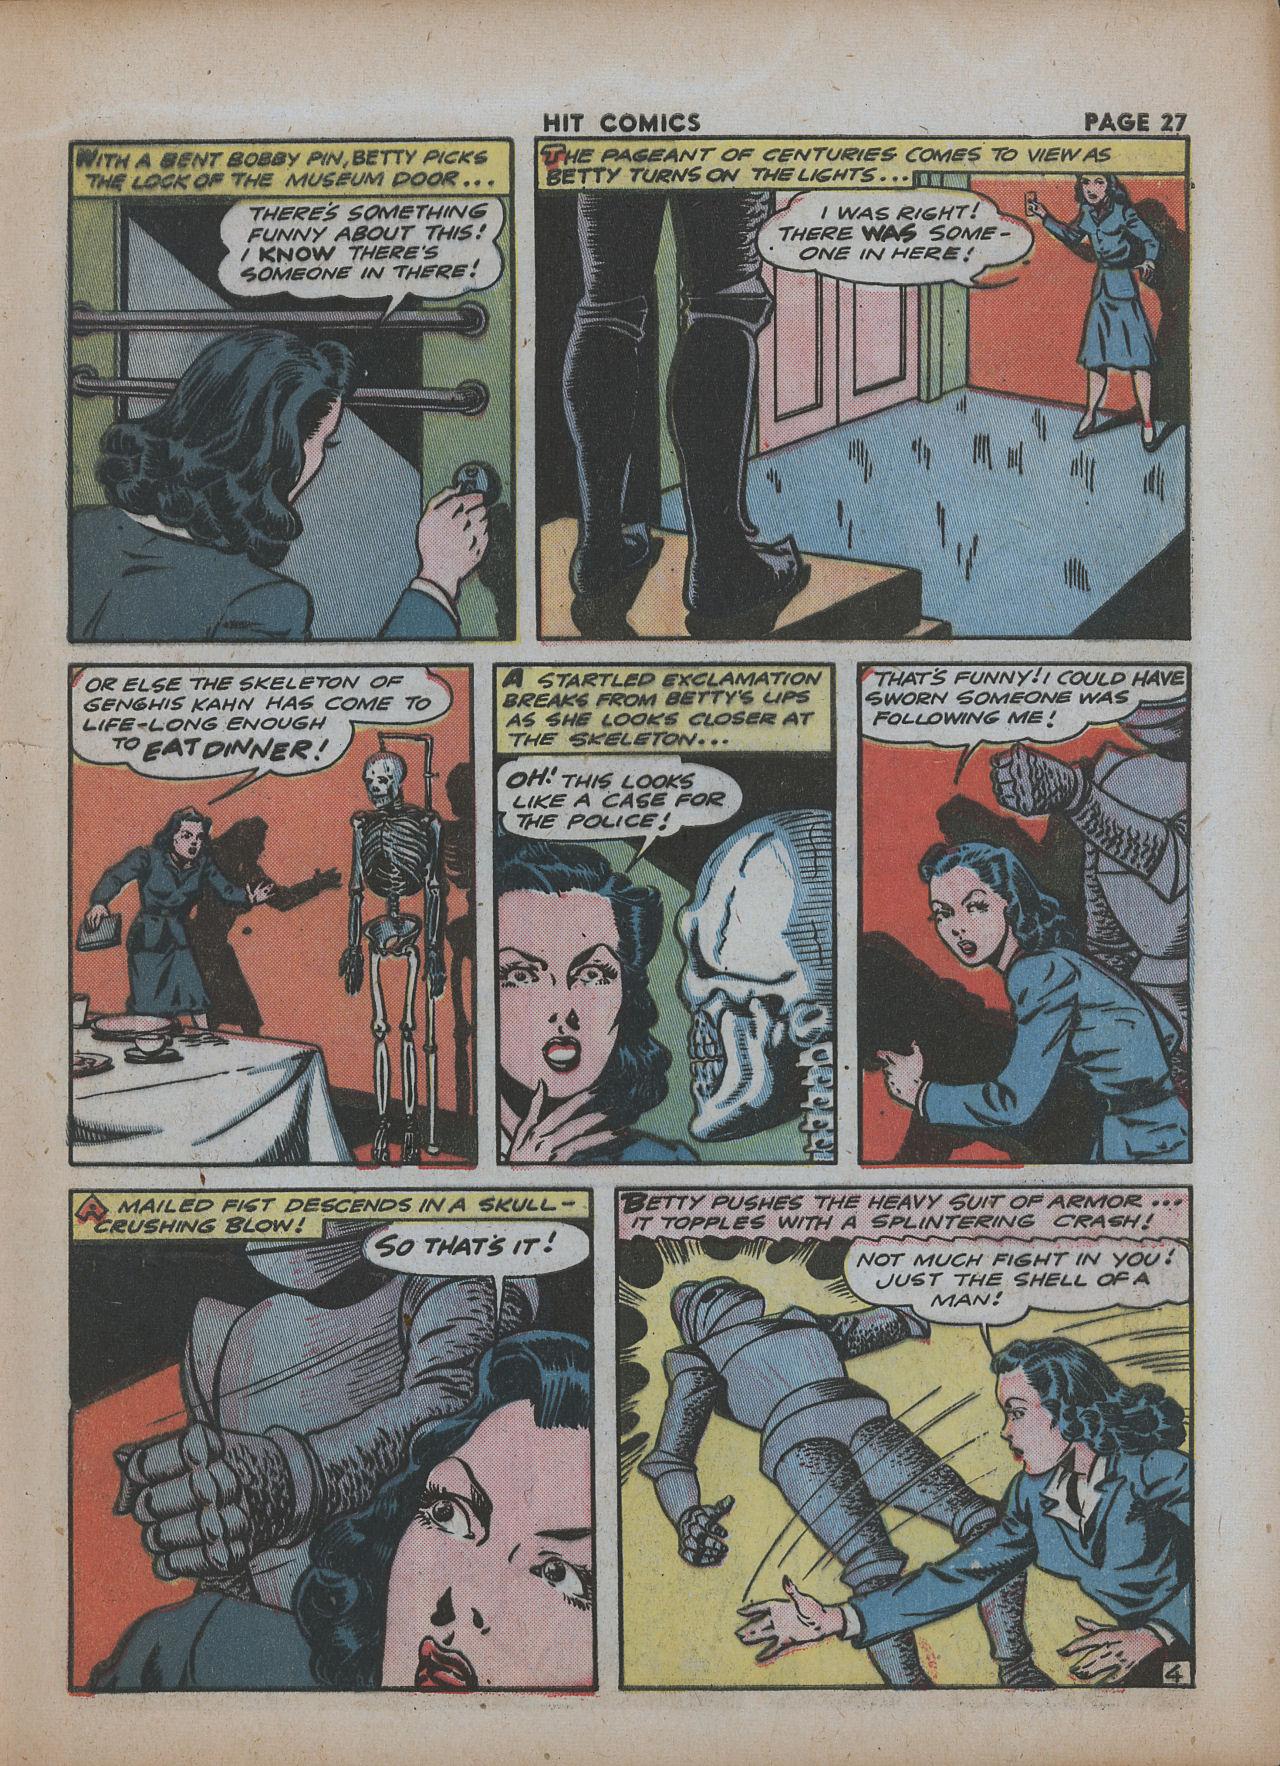 Read online Hit Comics comic -  Issue #26 - 29